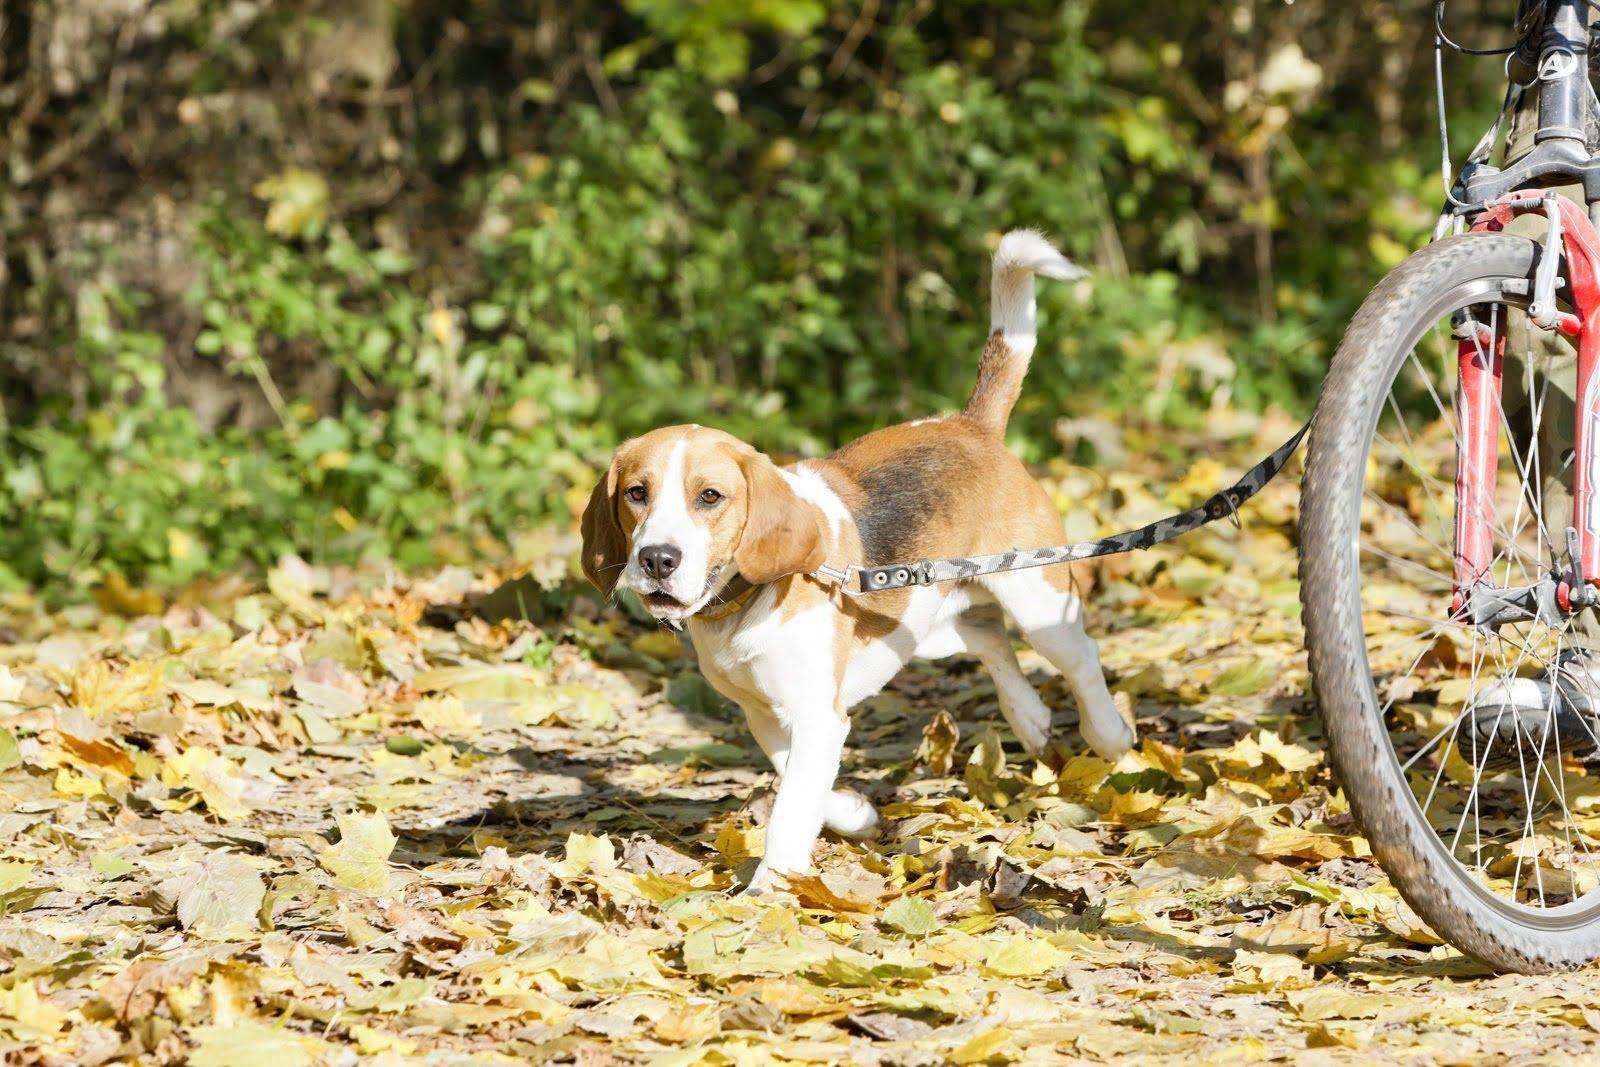 Dog on leash crate training